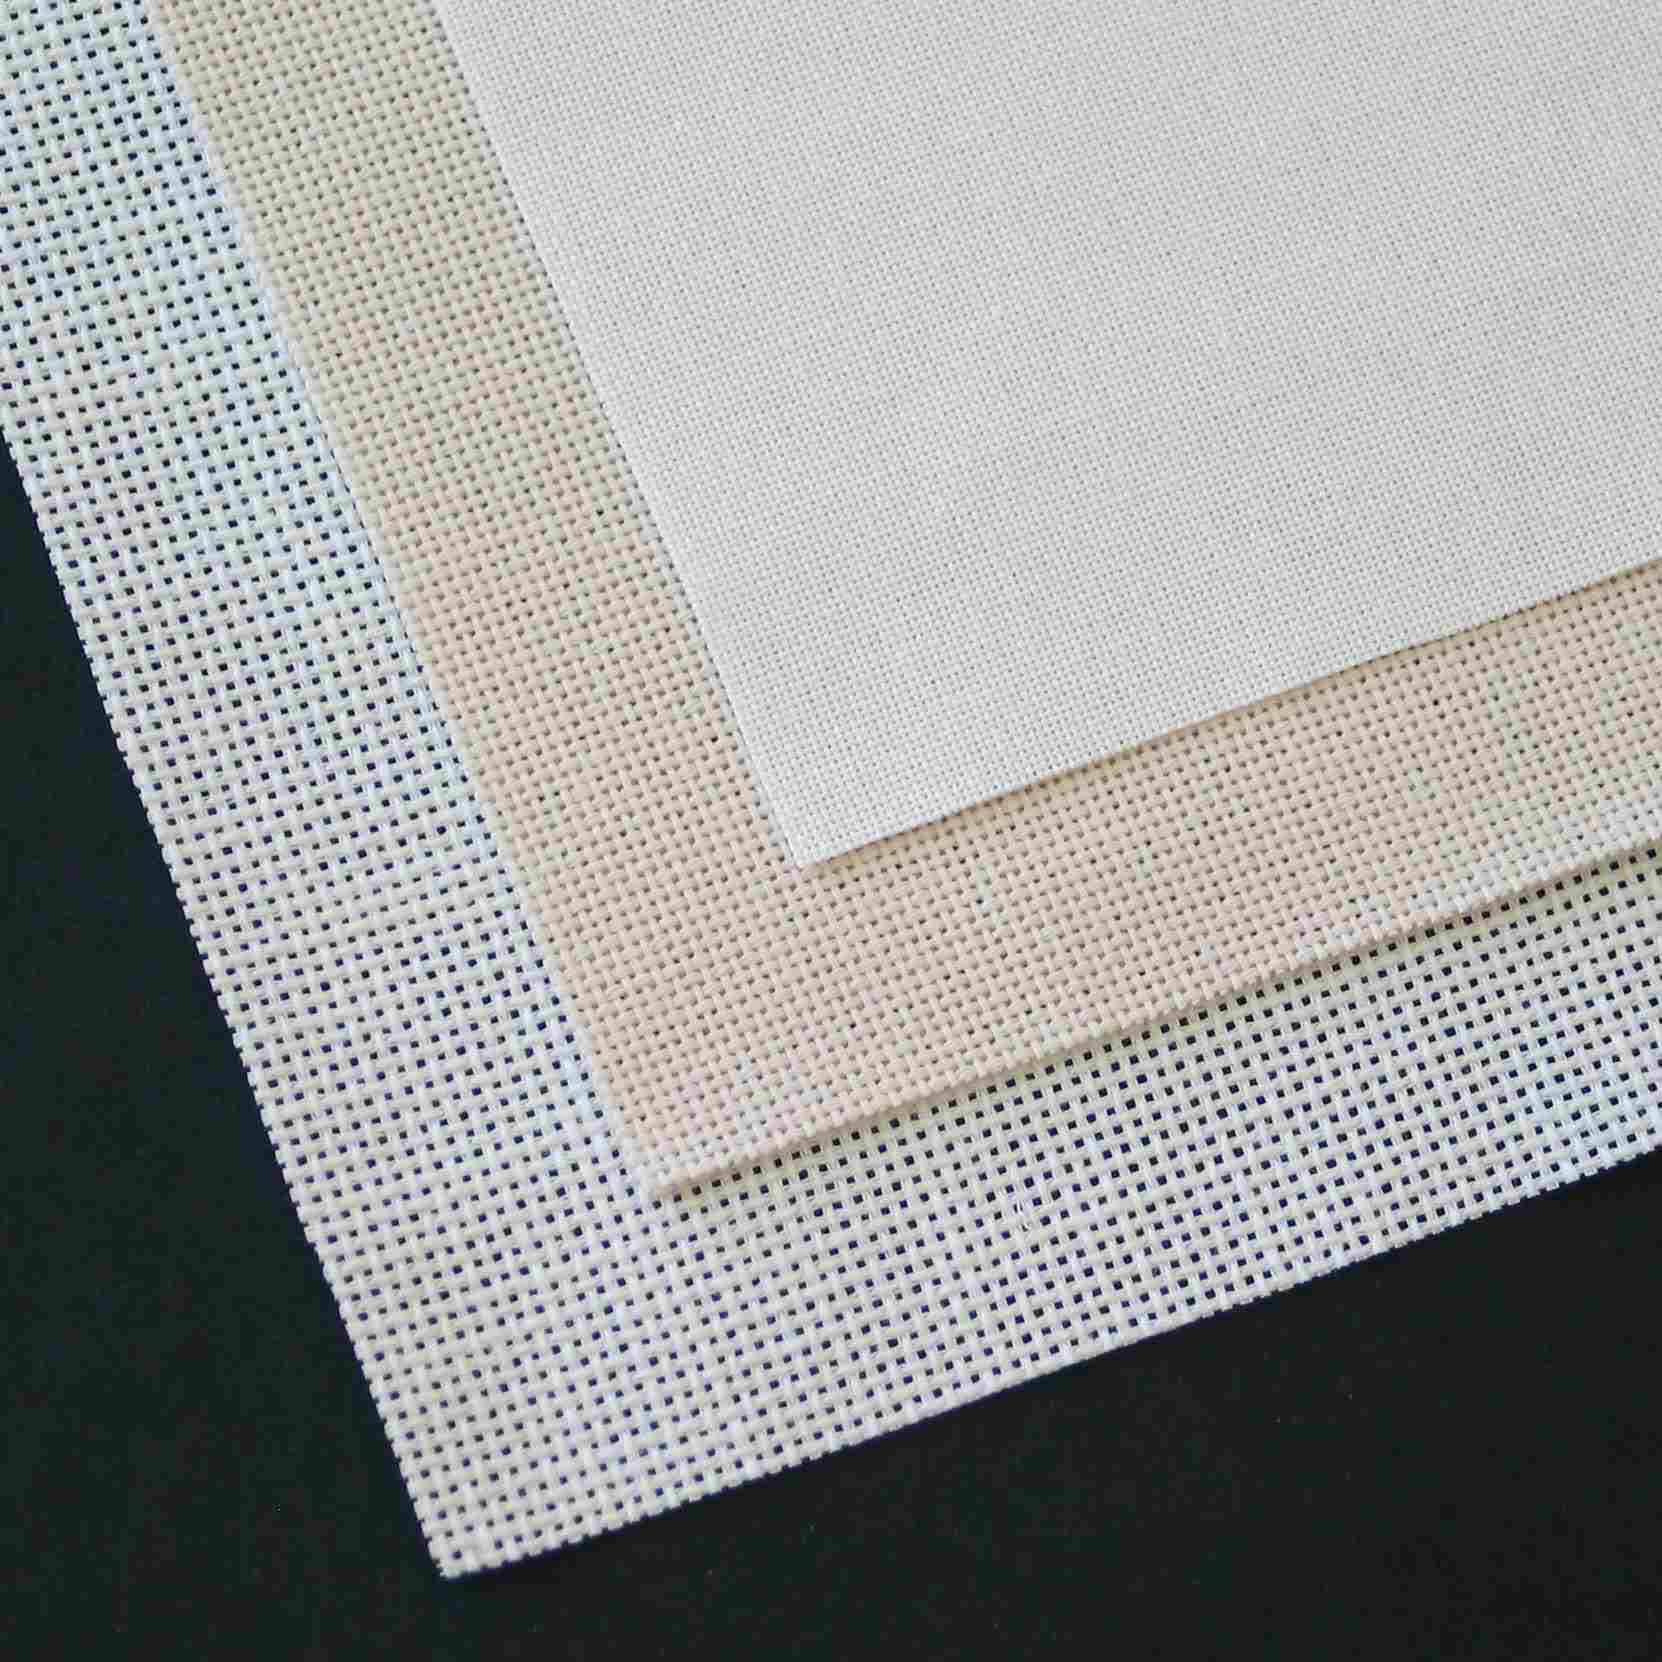 Assorted Evenweave Fabrics